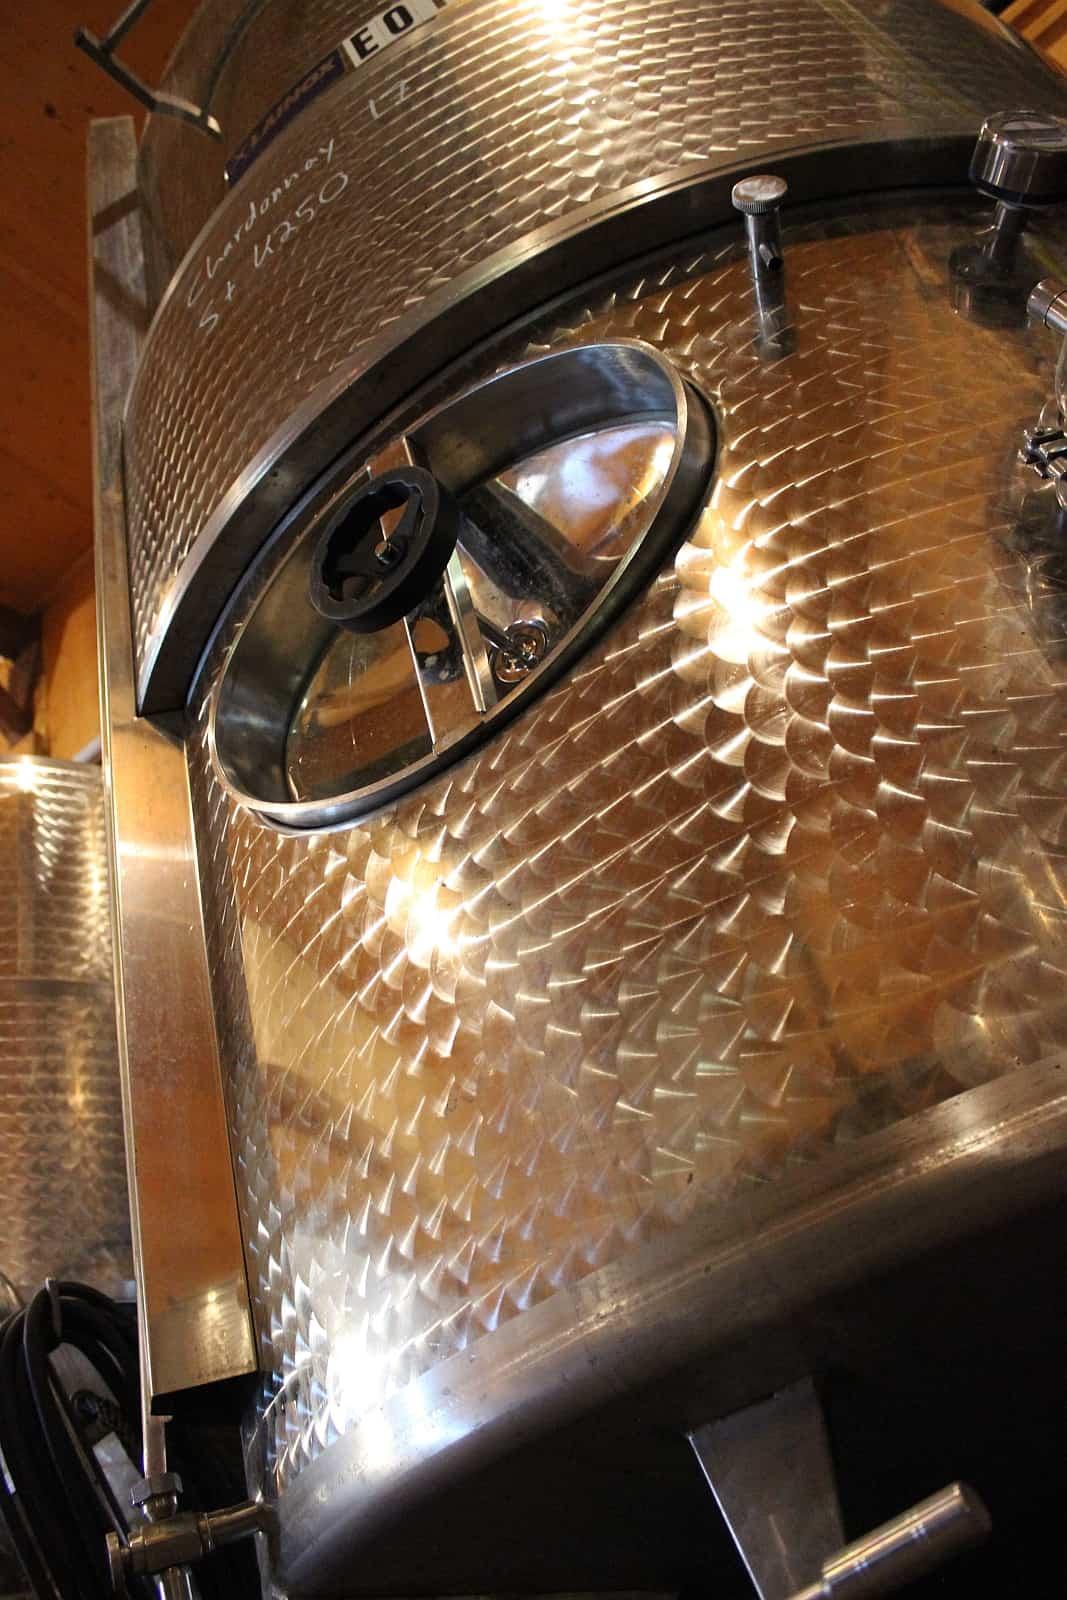 Egal ob aus dem Holzfass oder dem Edelstahltank, die Weine aus Kanada sind exzellent. Foto Between the Lines Winery, NotL